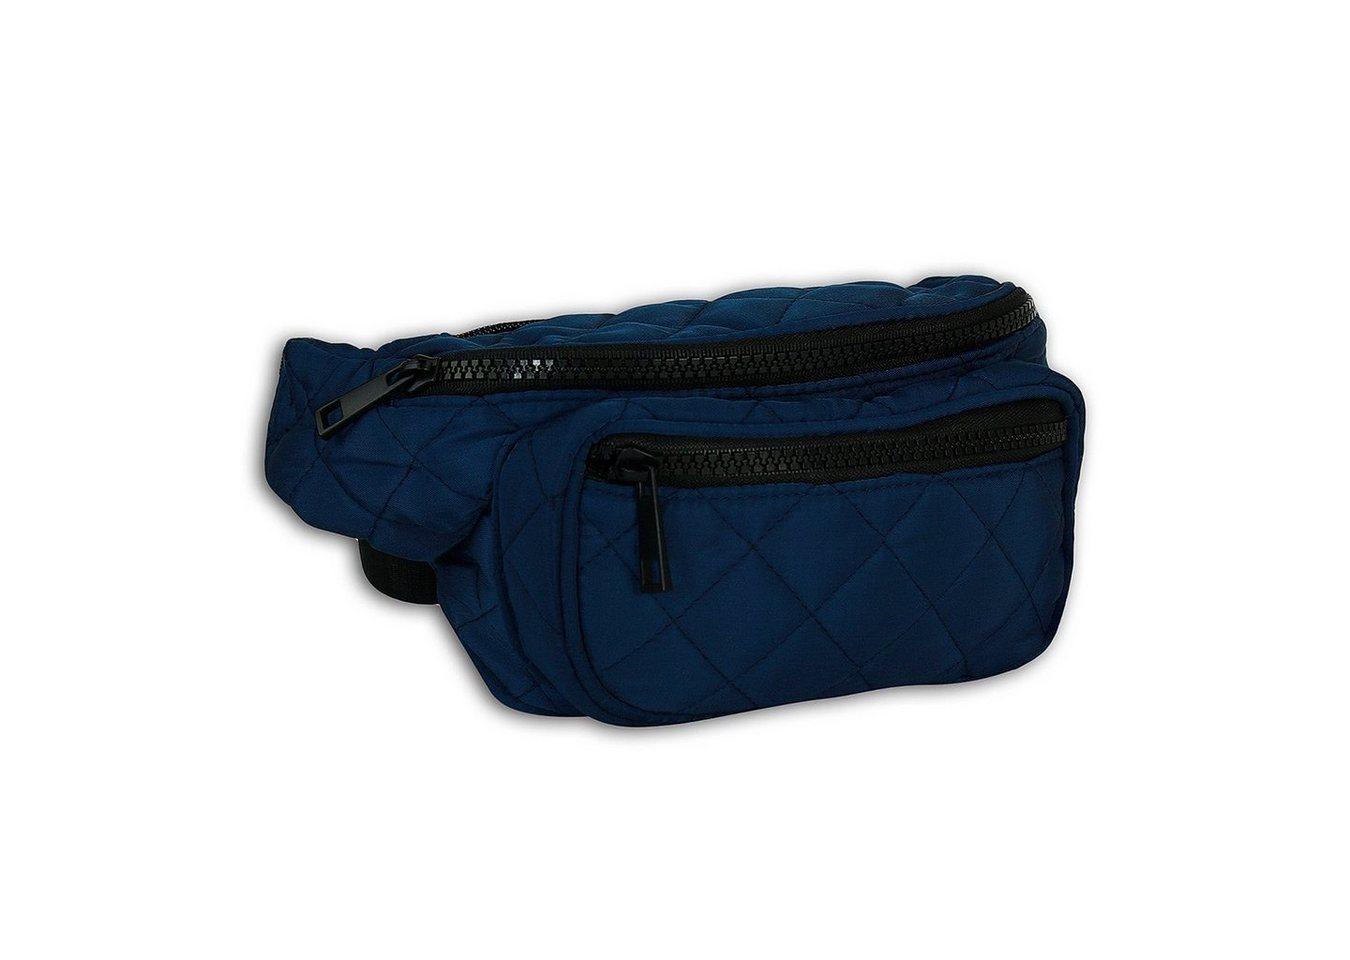 new bags -  Gürteltasche »OTD5026X  Damen Hüfttasche Gürteltasche« (Gürteltasche), Damen, Jugend Tasche blau, ca. 24cm x ca. 10cm